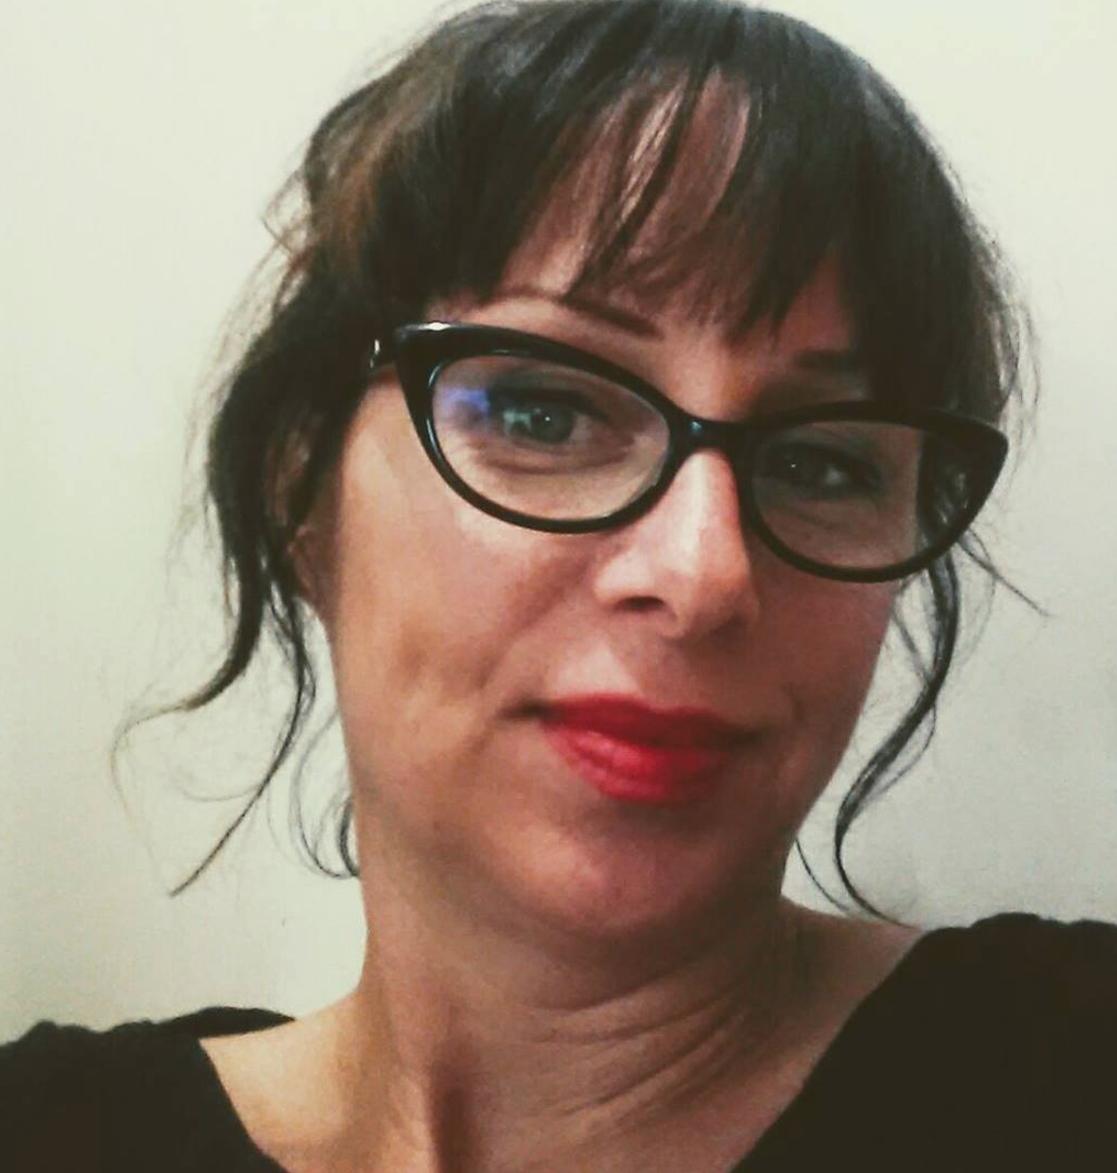 Amy VanHise - selfie